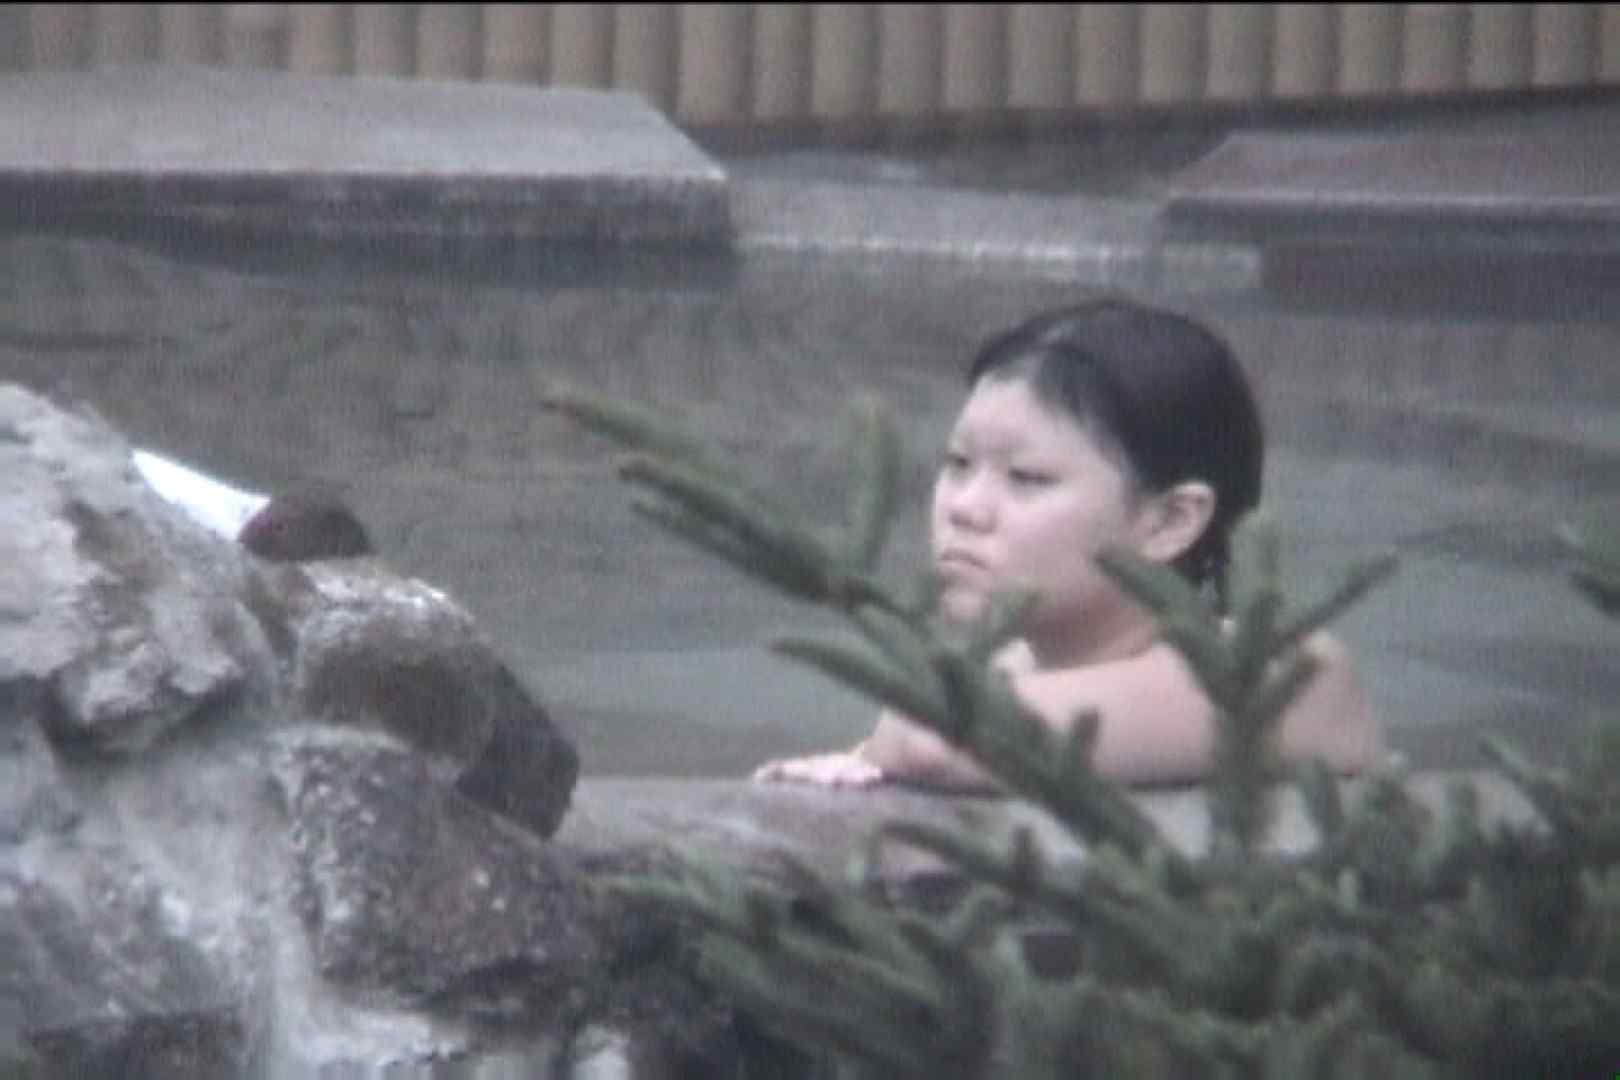 Aquaな露天風呂Vol.09 盗撮 | OLエロ画像  72PICs 1